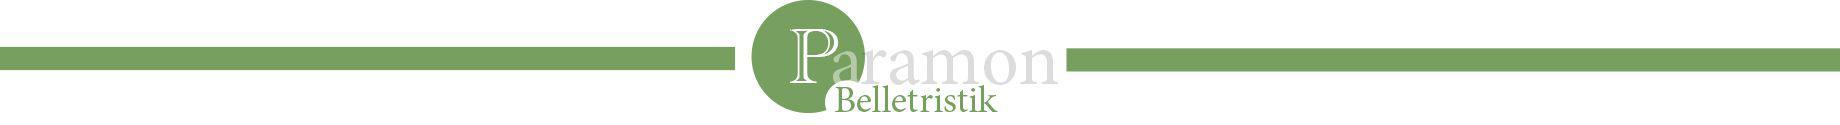 Belletristik-Verlag-Paramon